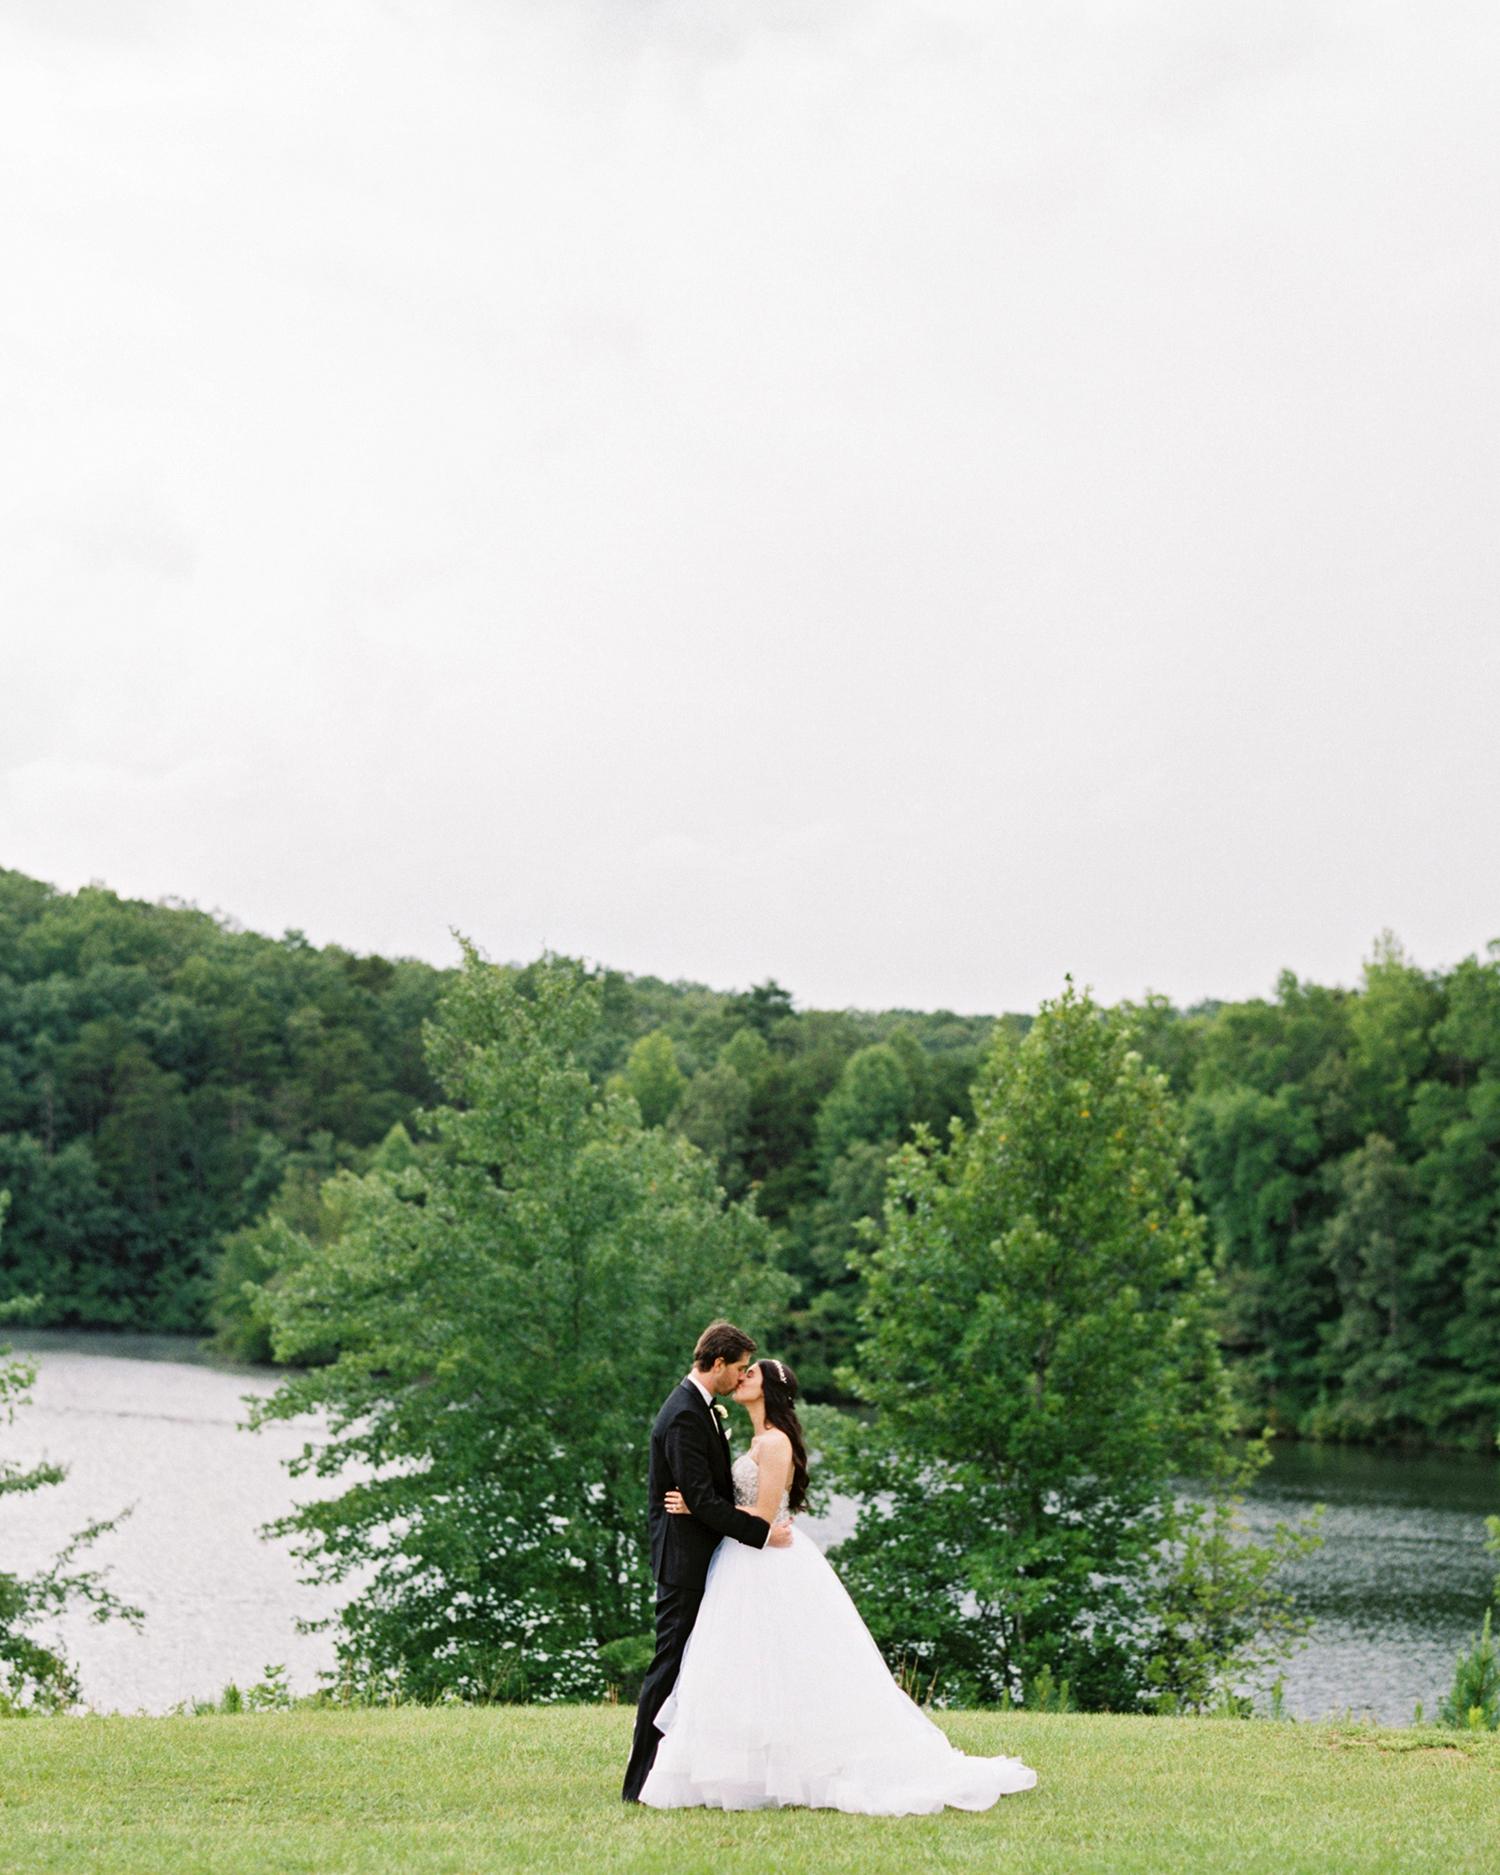 dani jackson wedding kiss near water